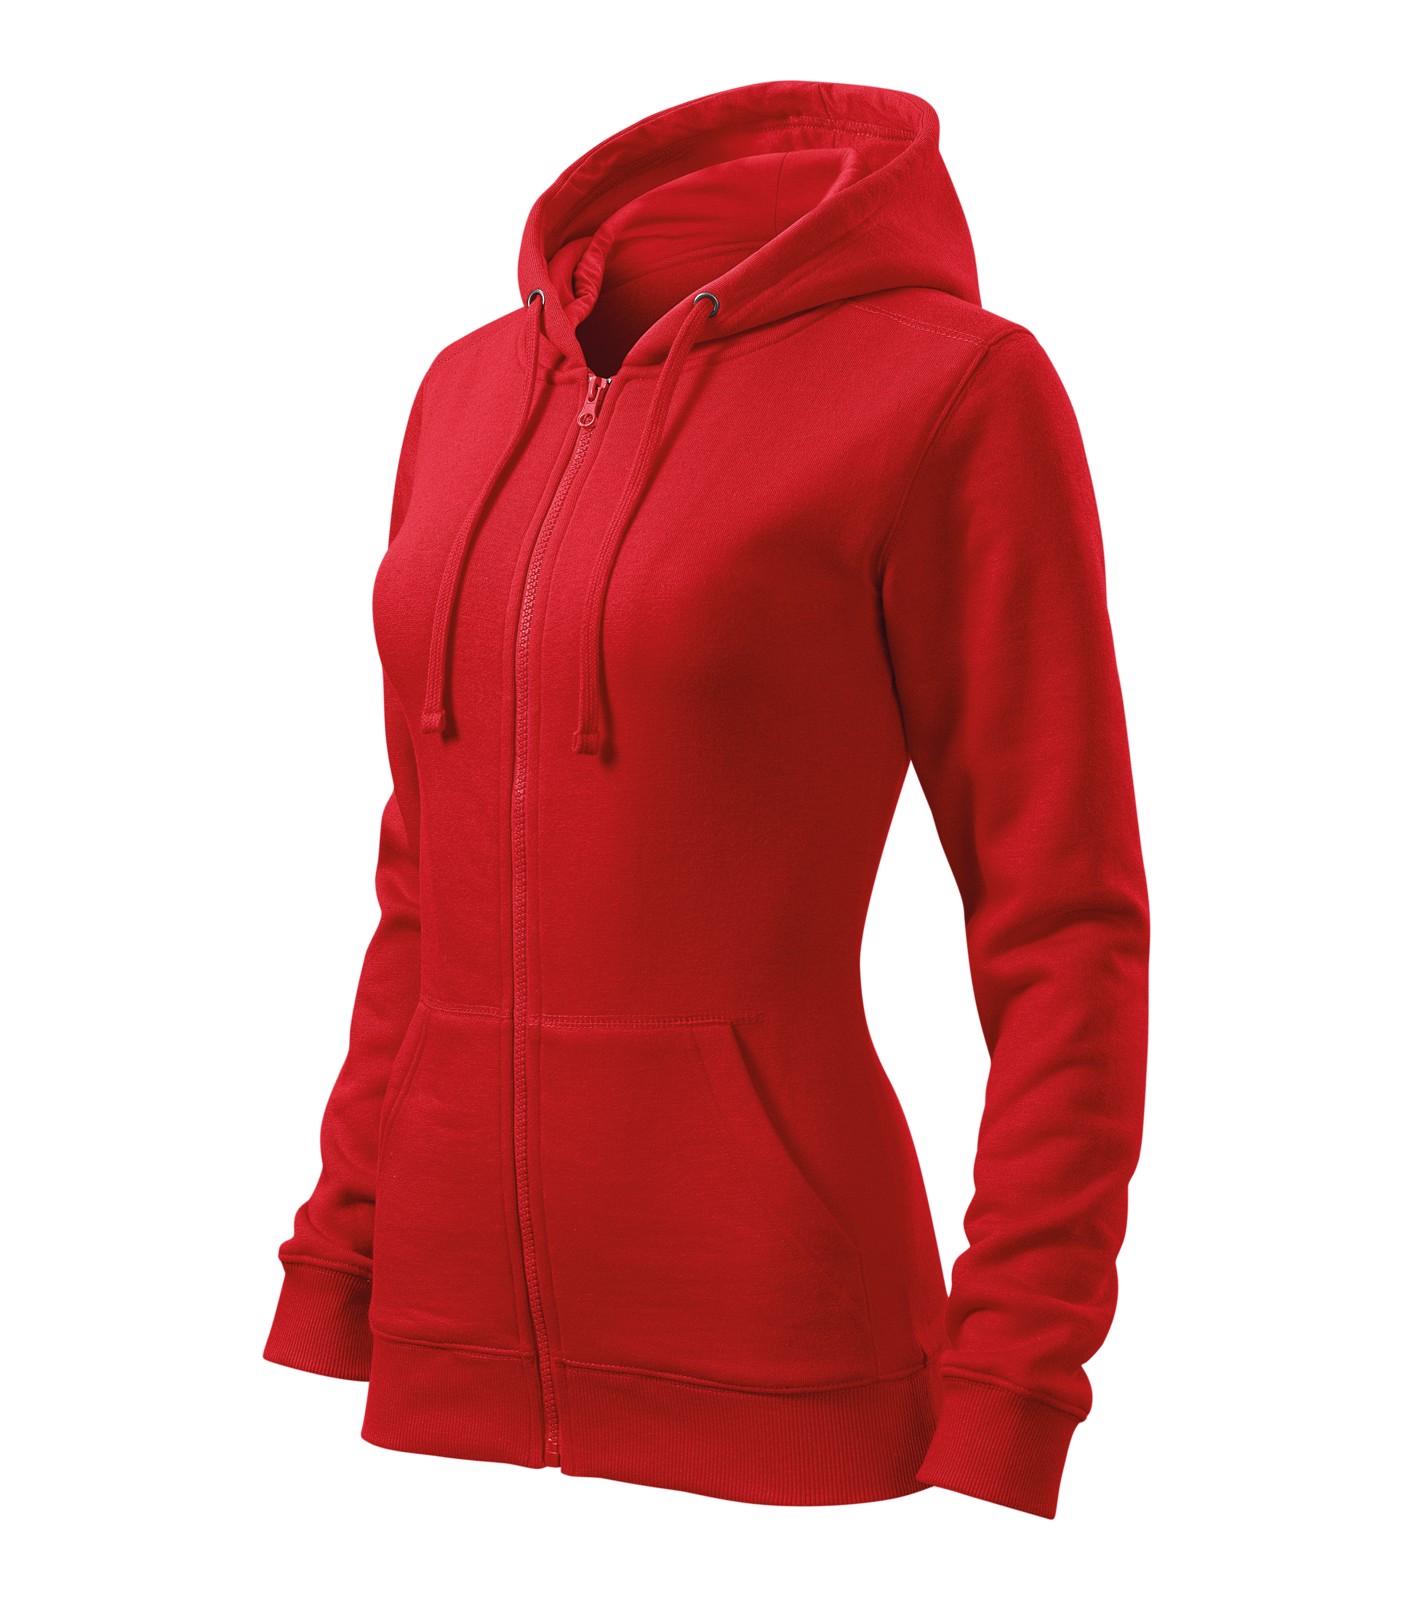 Sweatshirt women's Malfini Trendy Zipper - Red / 2XL